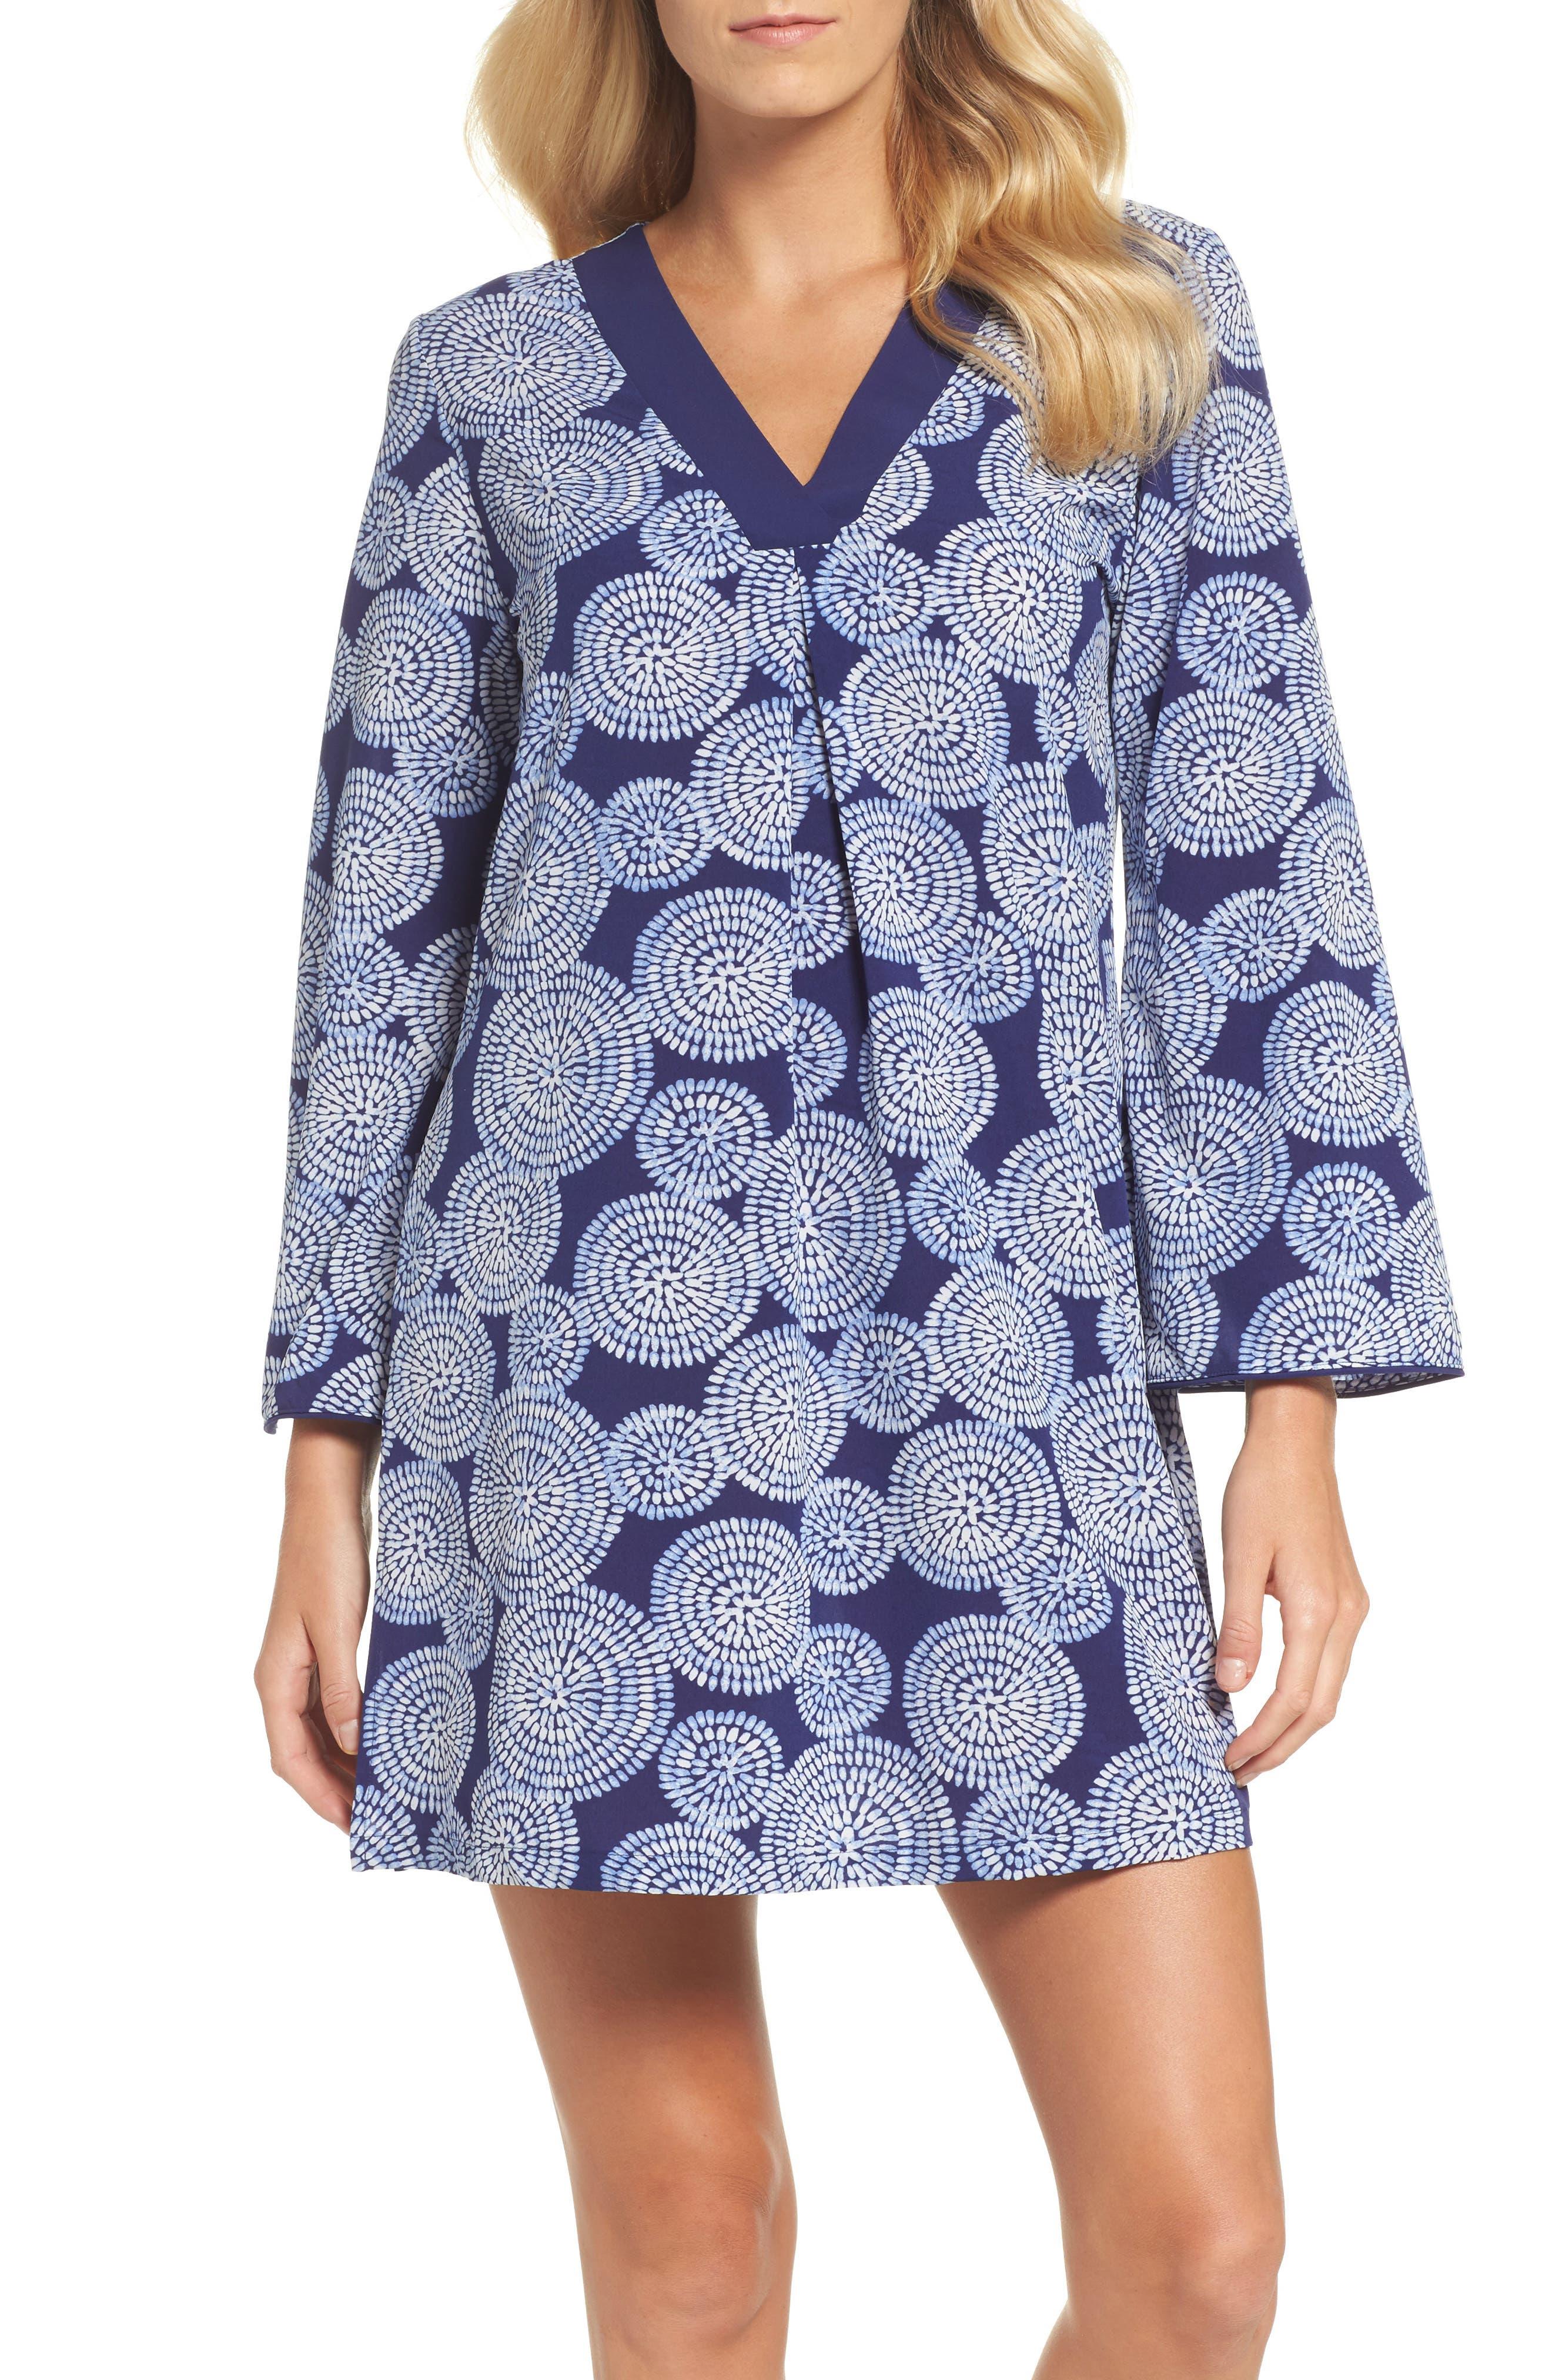 Sleepwear Halftan Short Nightgown,                         Main,                         color, Eclipse Print